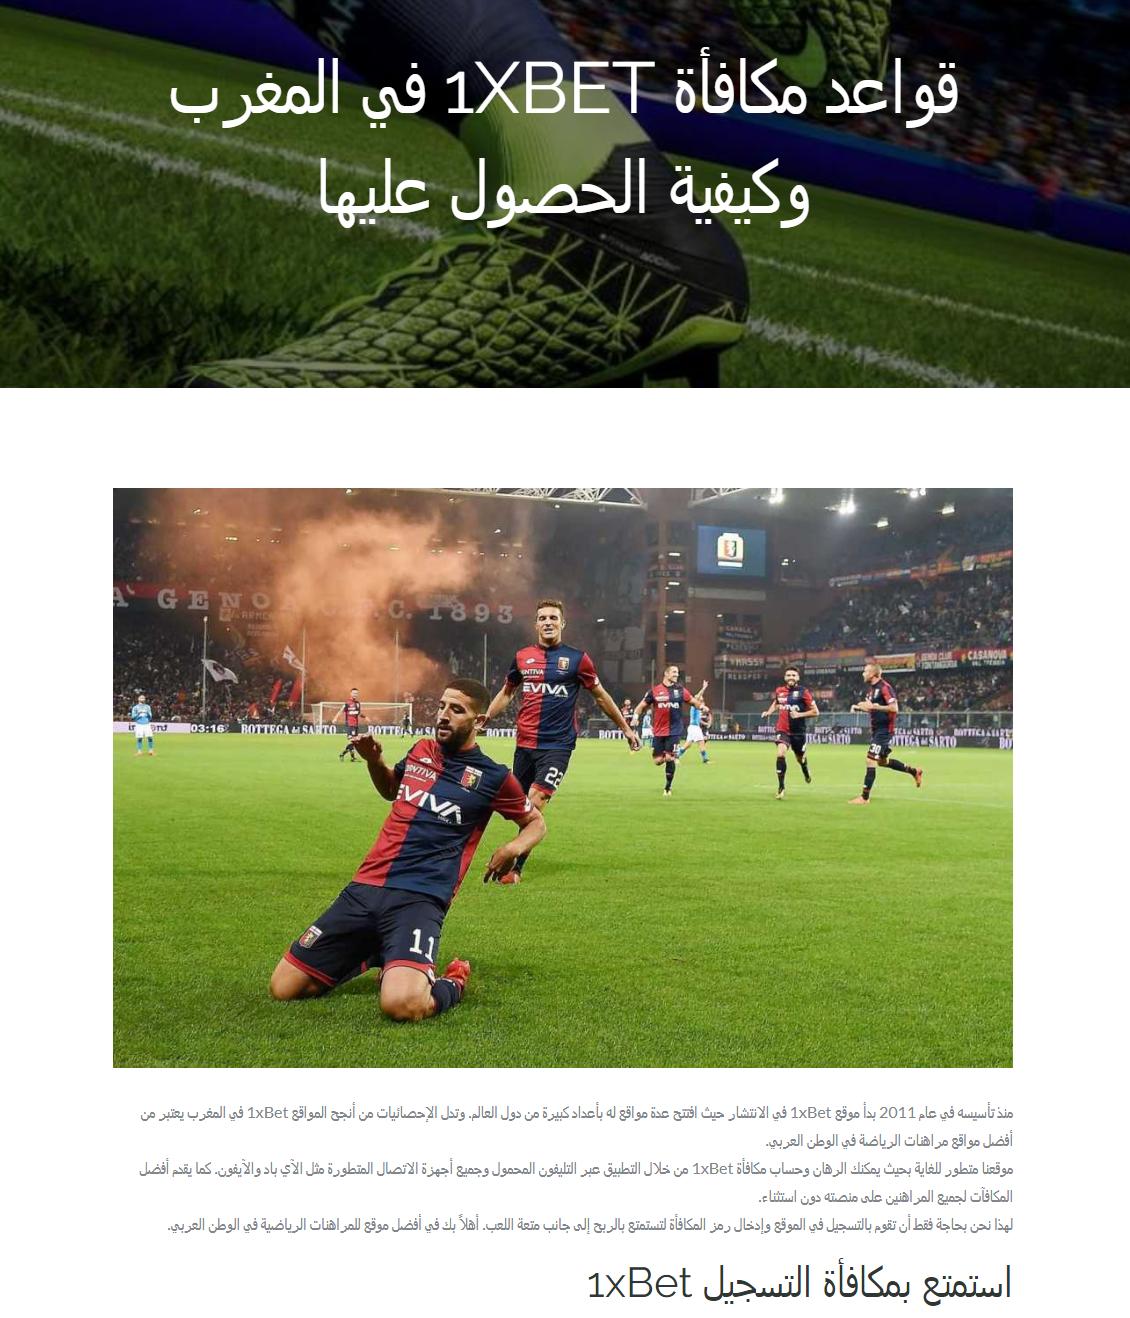 Копирайтинг на арабском на тему беттинга